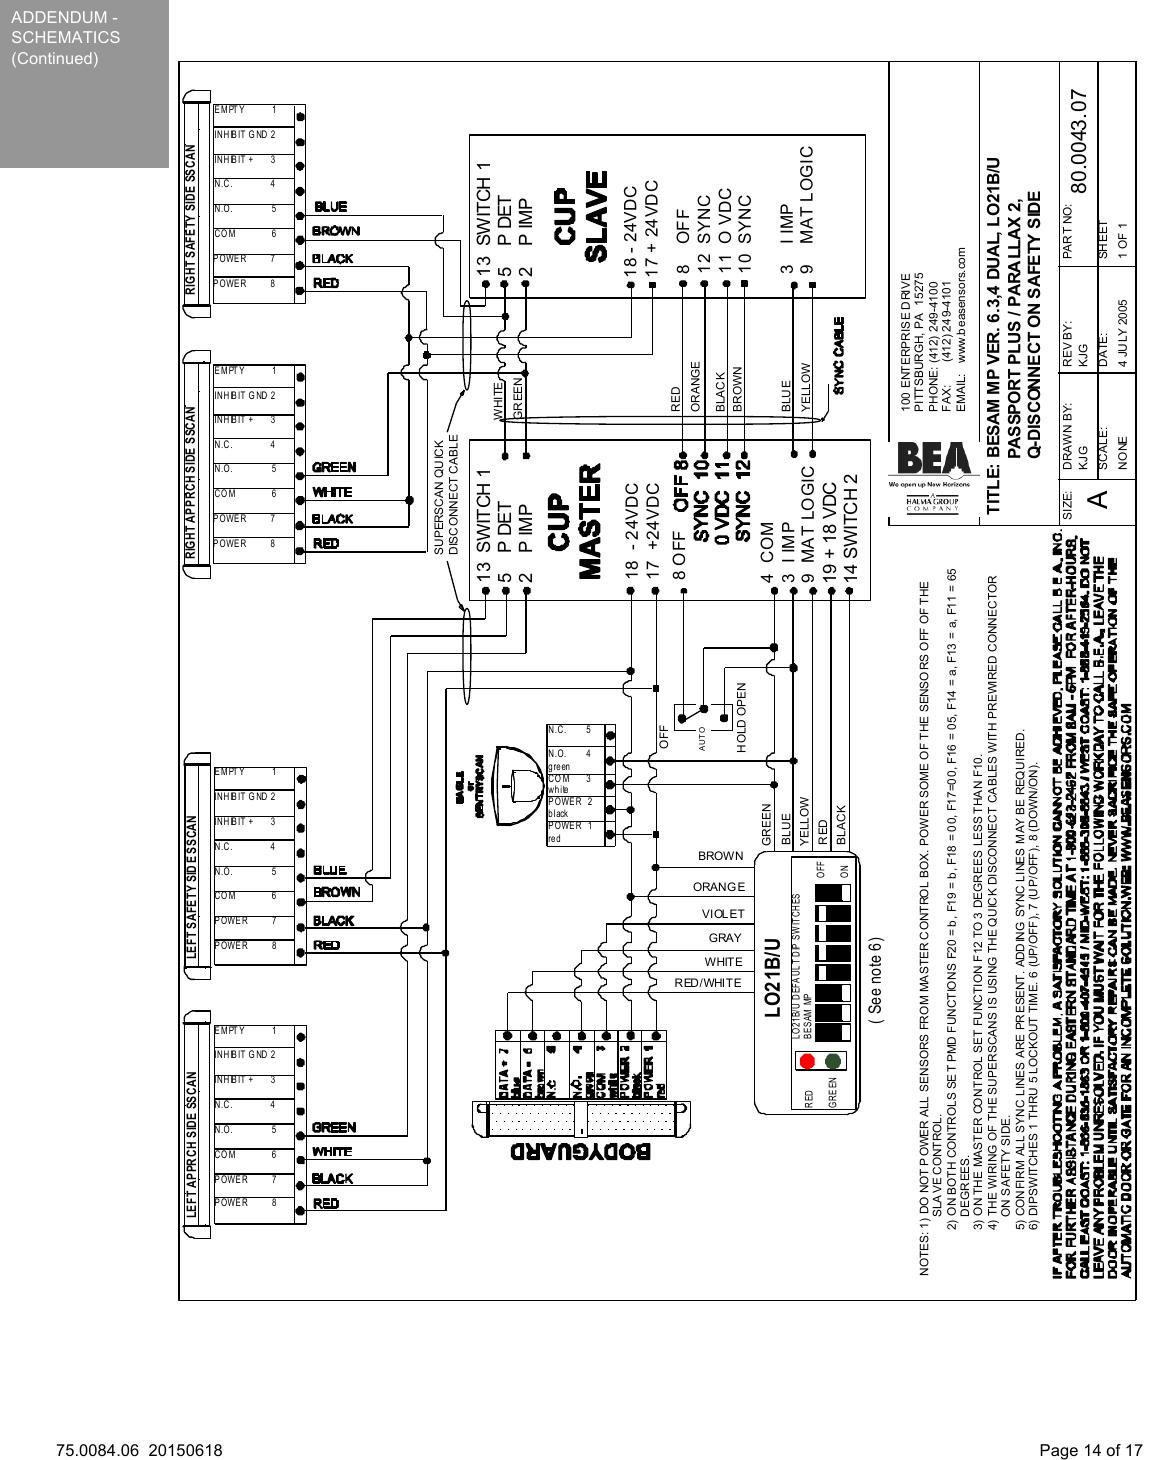 Diagram Of Honda Atv Parts 2005 Trx450r A Wire Harness 0405 Diagram